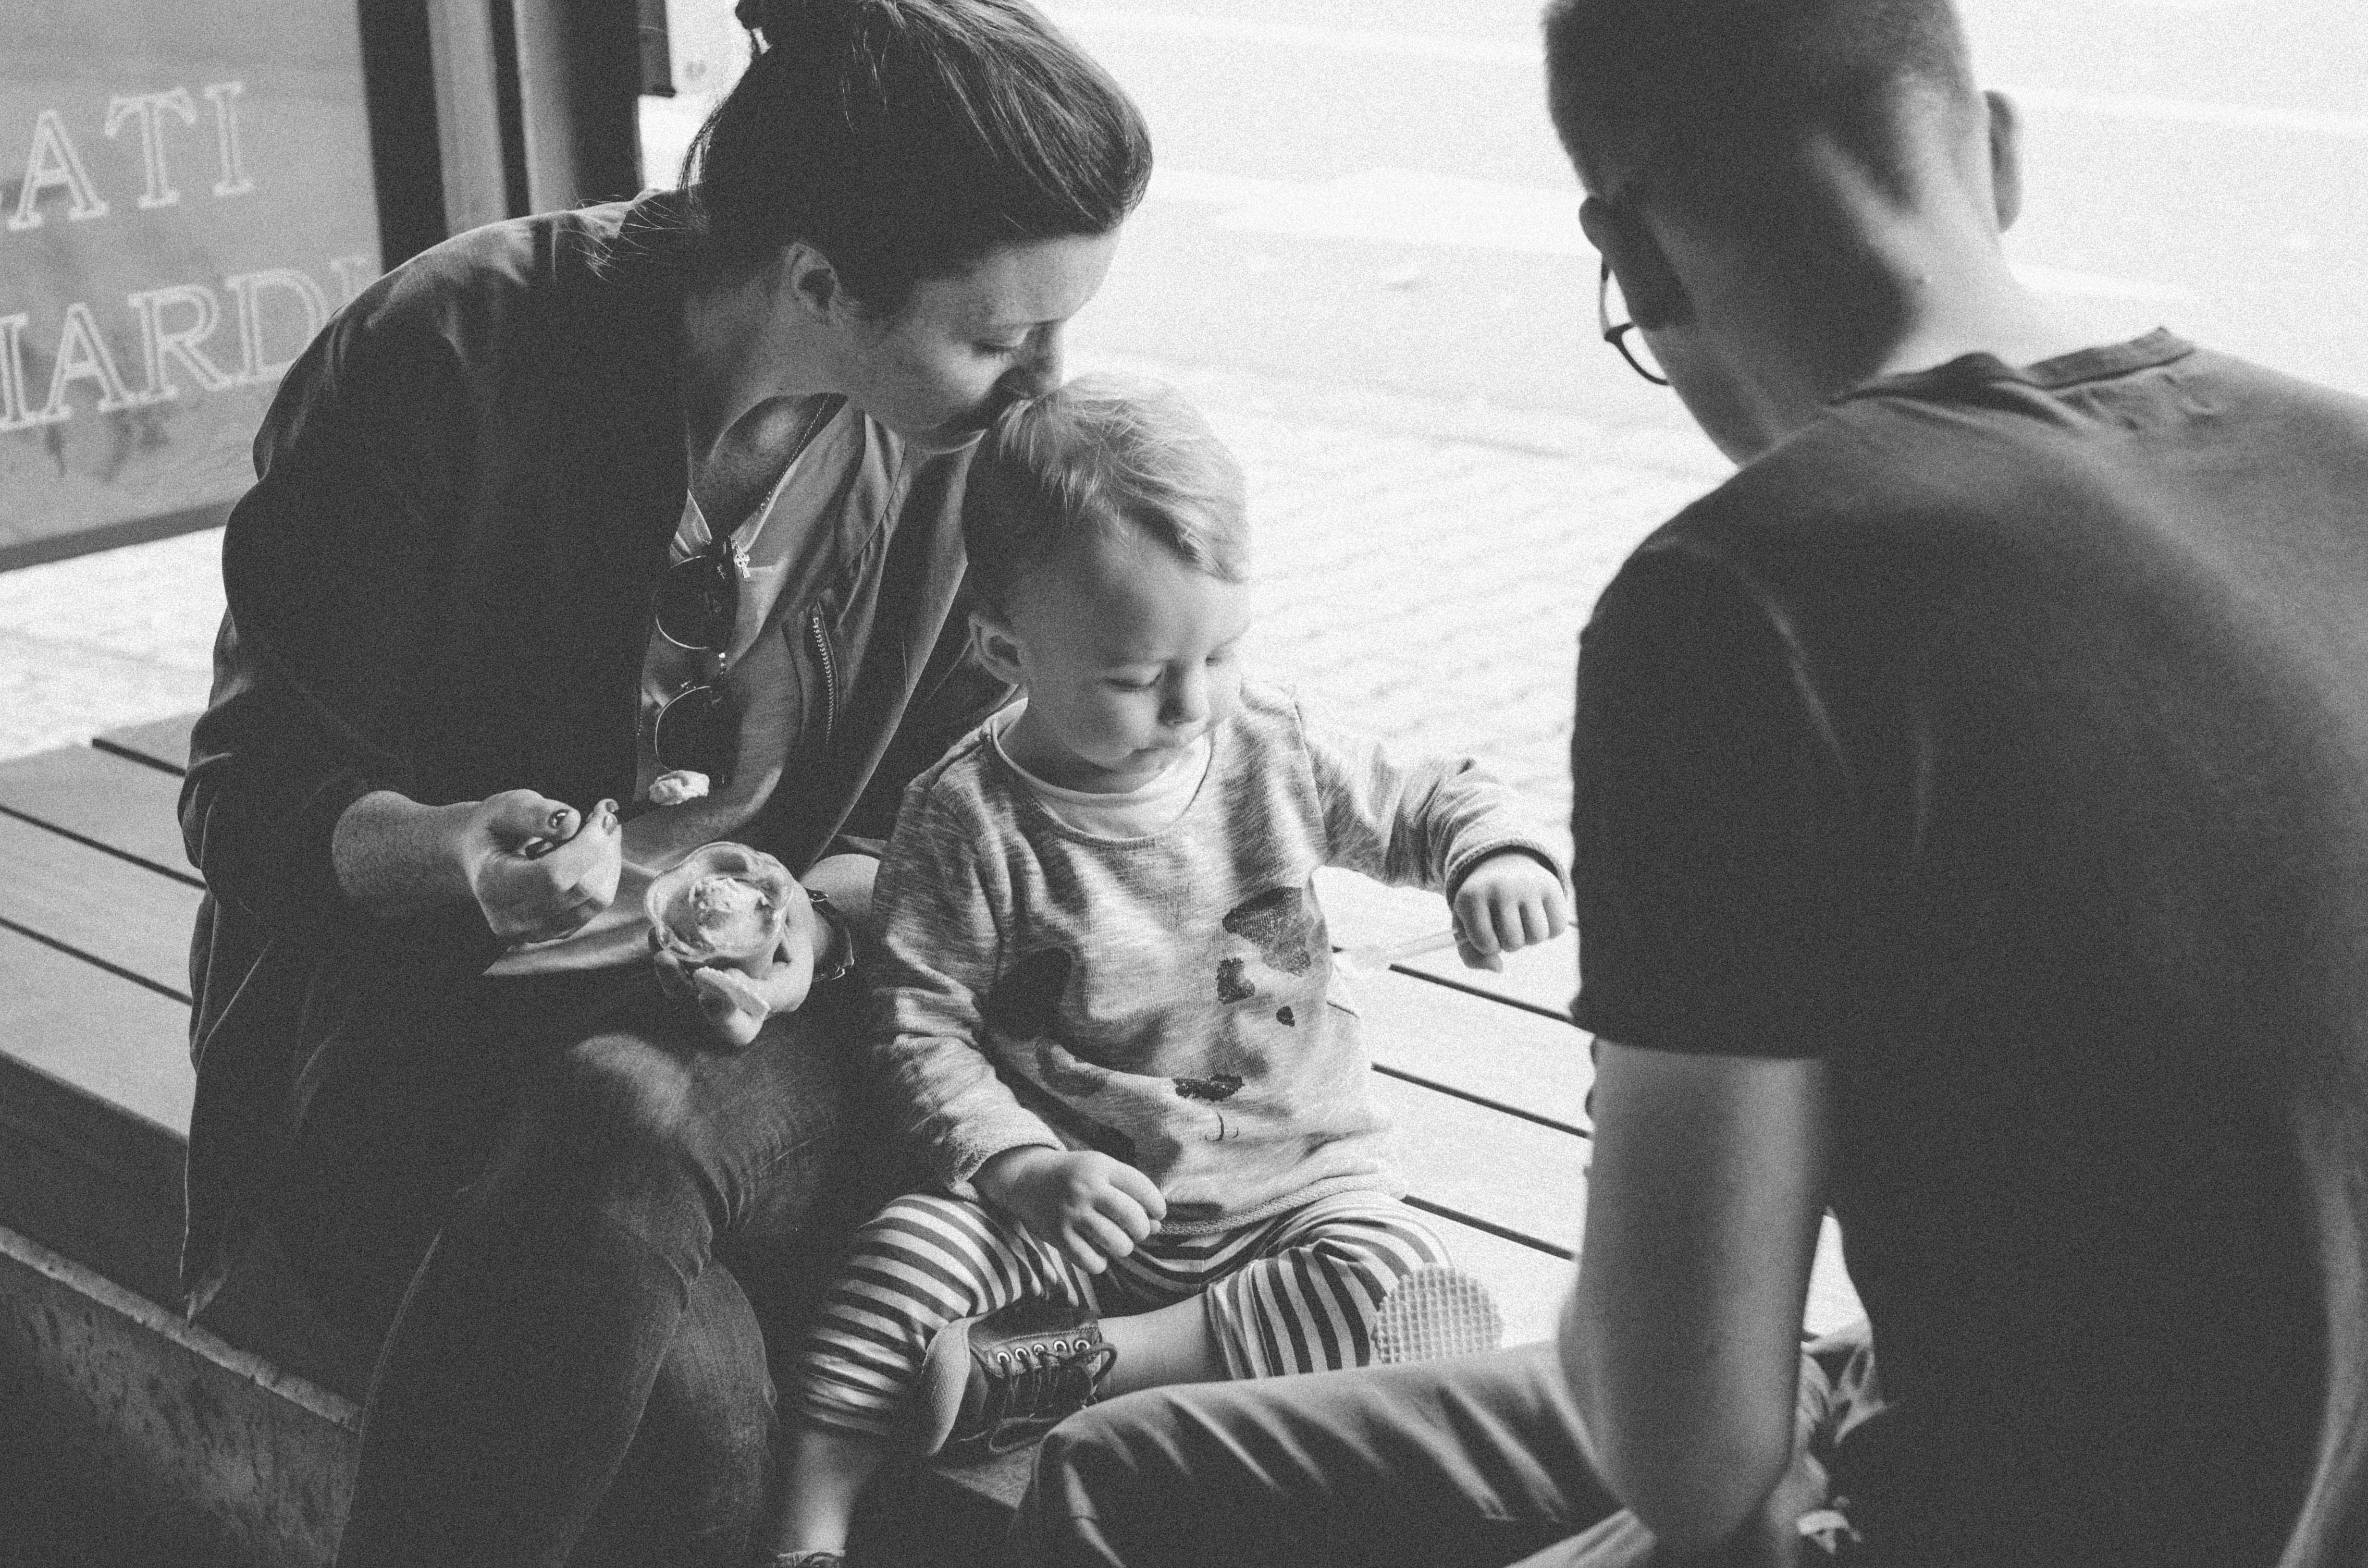 Dokumentarische-Familienfotografie-Eisladen